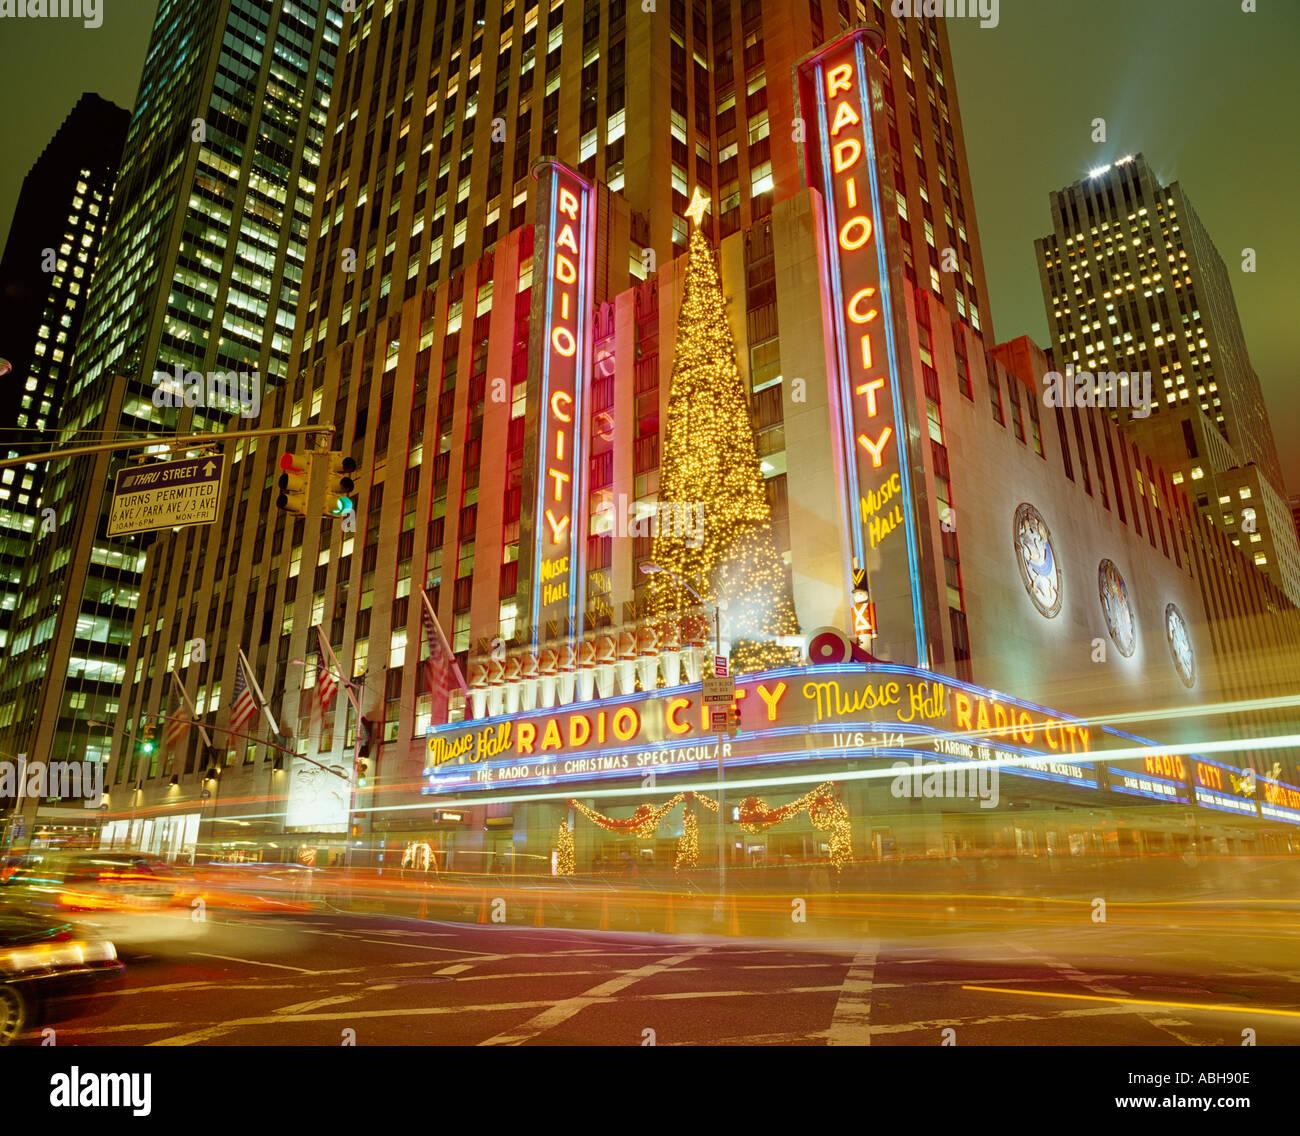 Radio City Music Hall Christmas New York USA Stockfoto, Bild ...